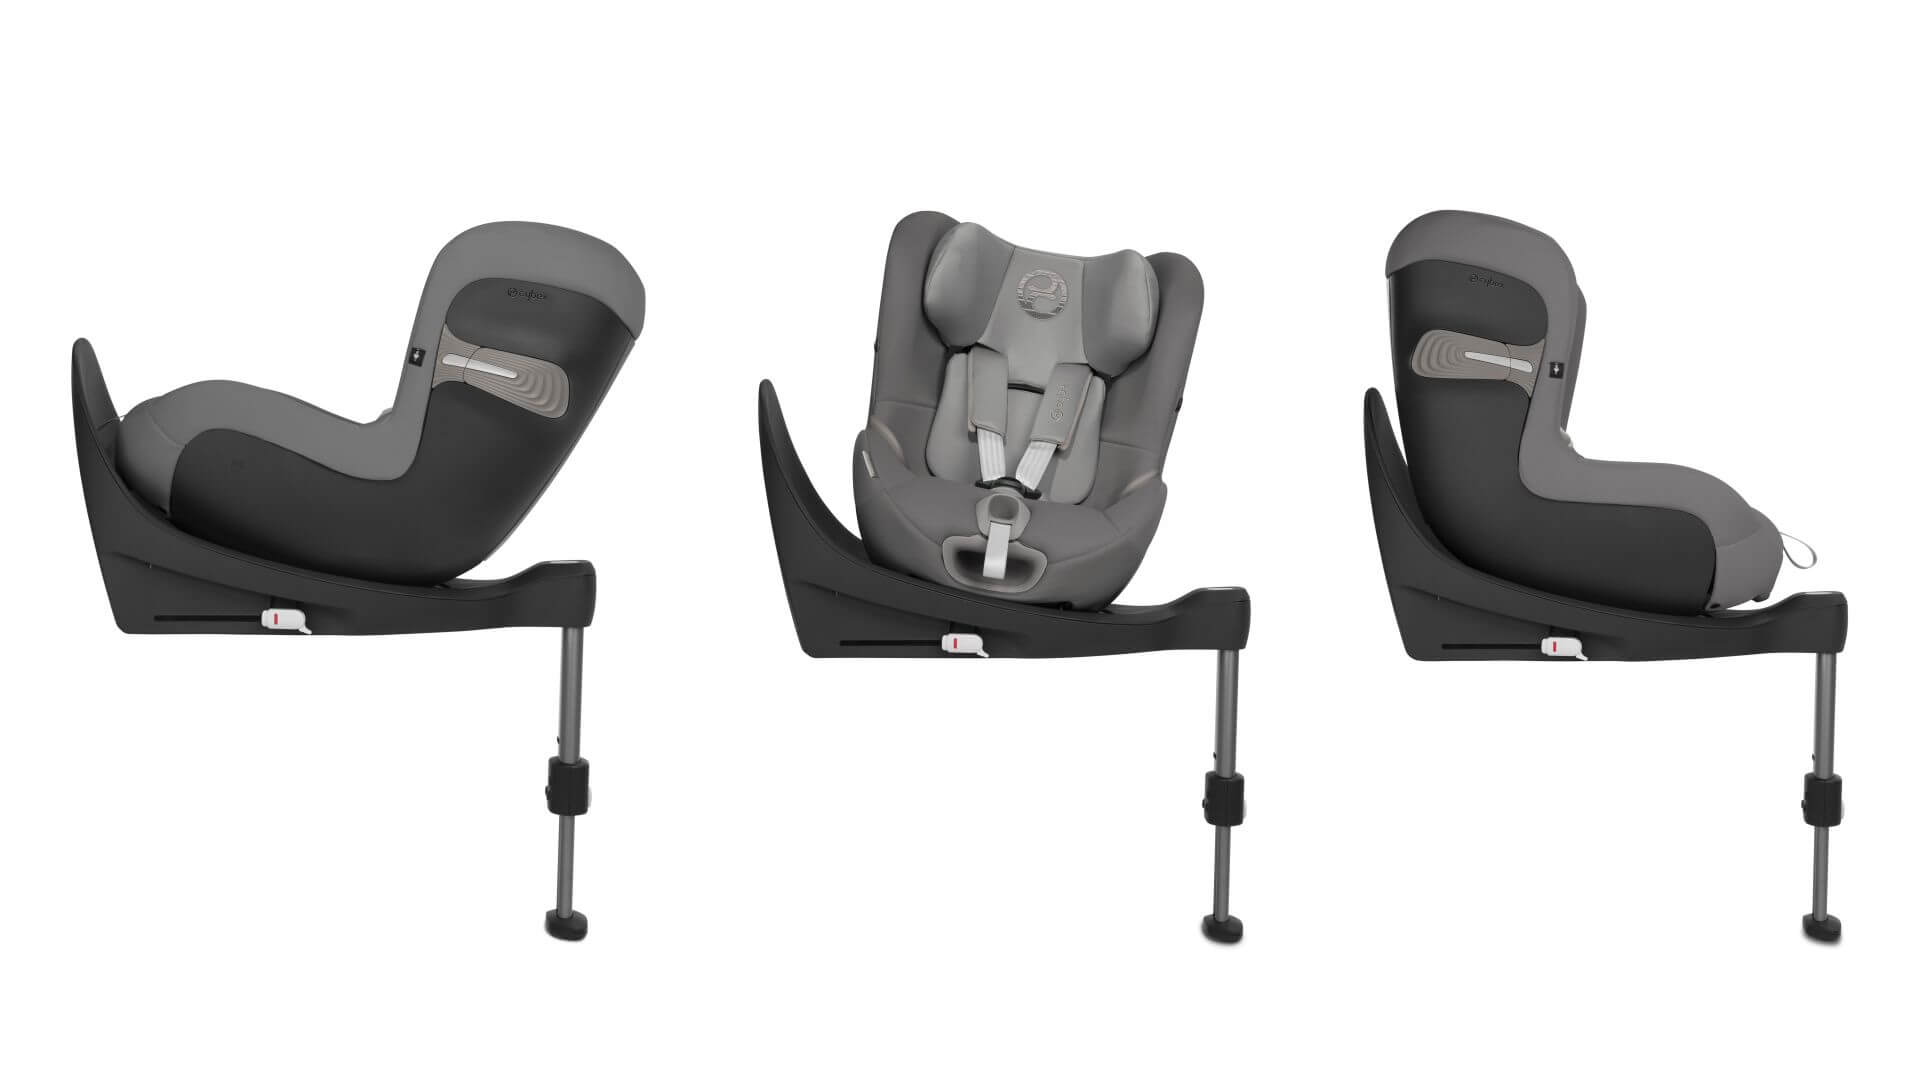 https://www.nolakids.ro/domains/nolakids.ro/files/files/images/Cybex%20Sirona%20S/scaun-auto-copii-cybex-sirona-s-i-size-manhattan-grey-3.jpg